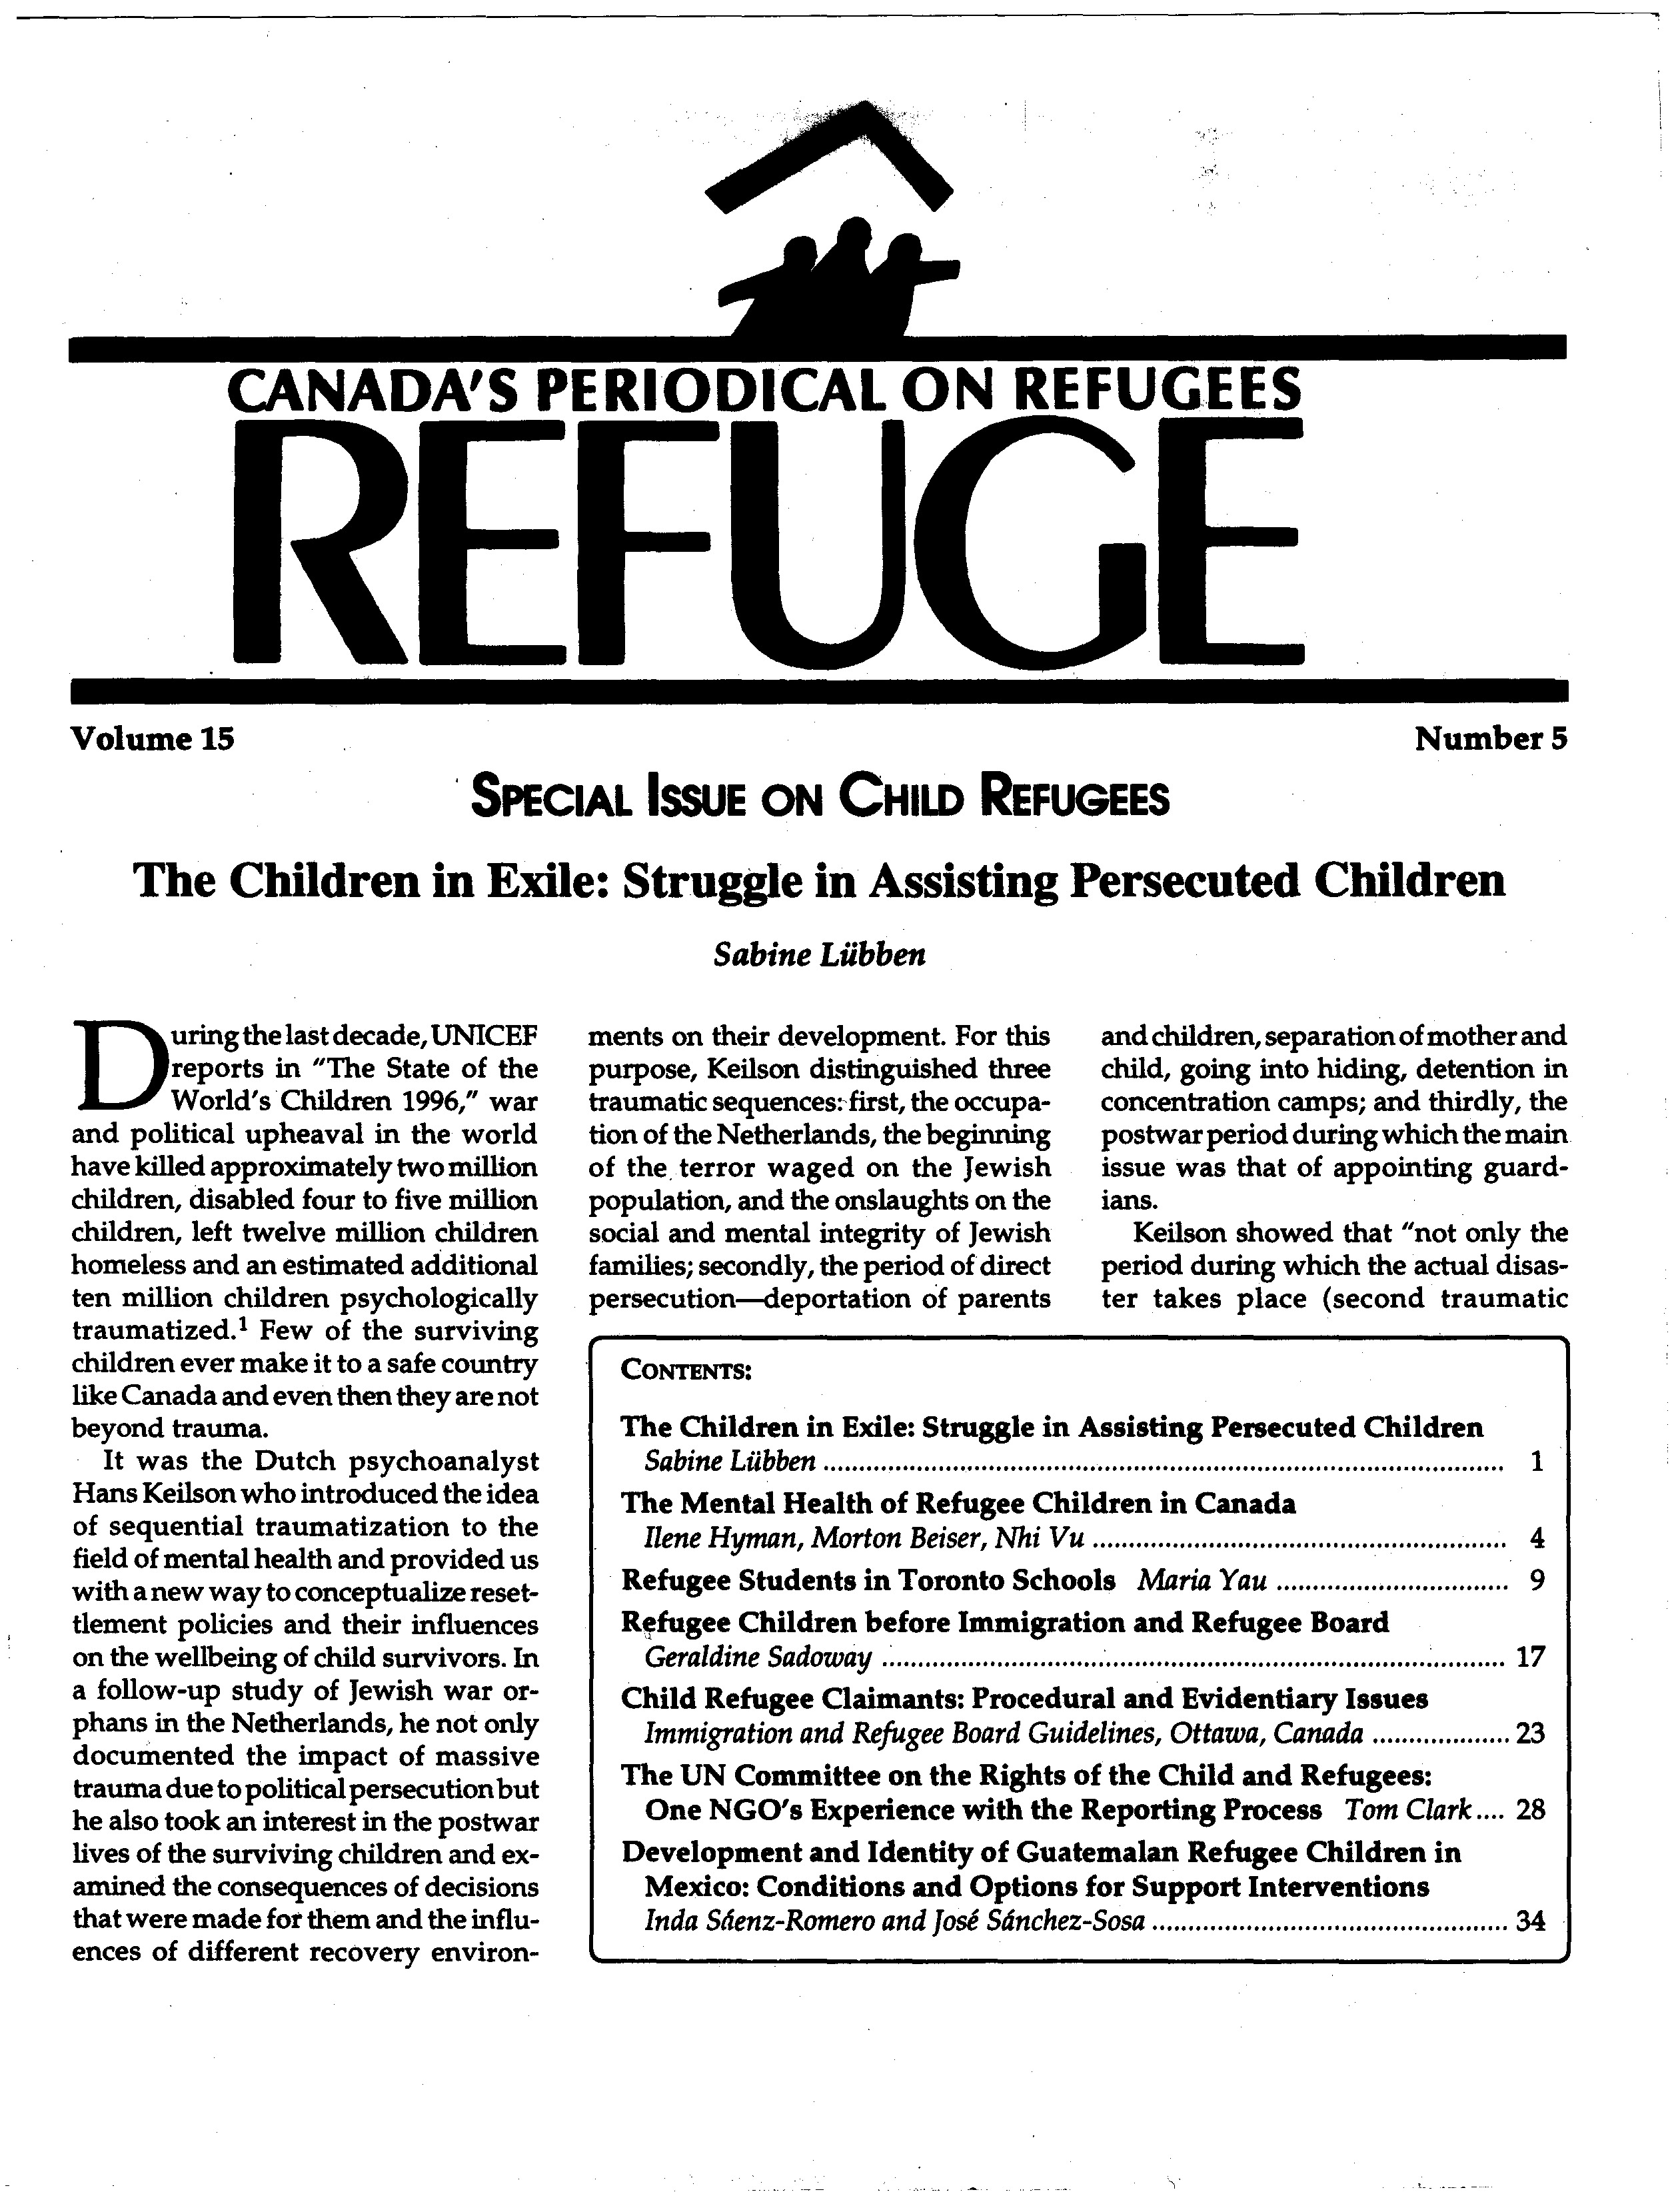 first page Refuge vol. 15.5 1996